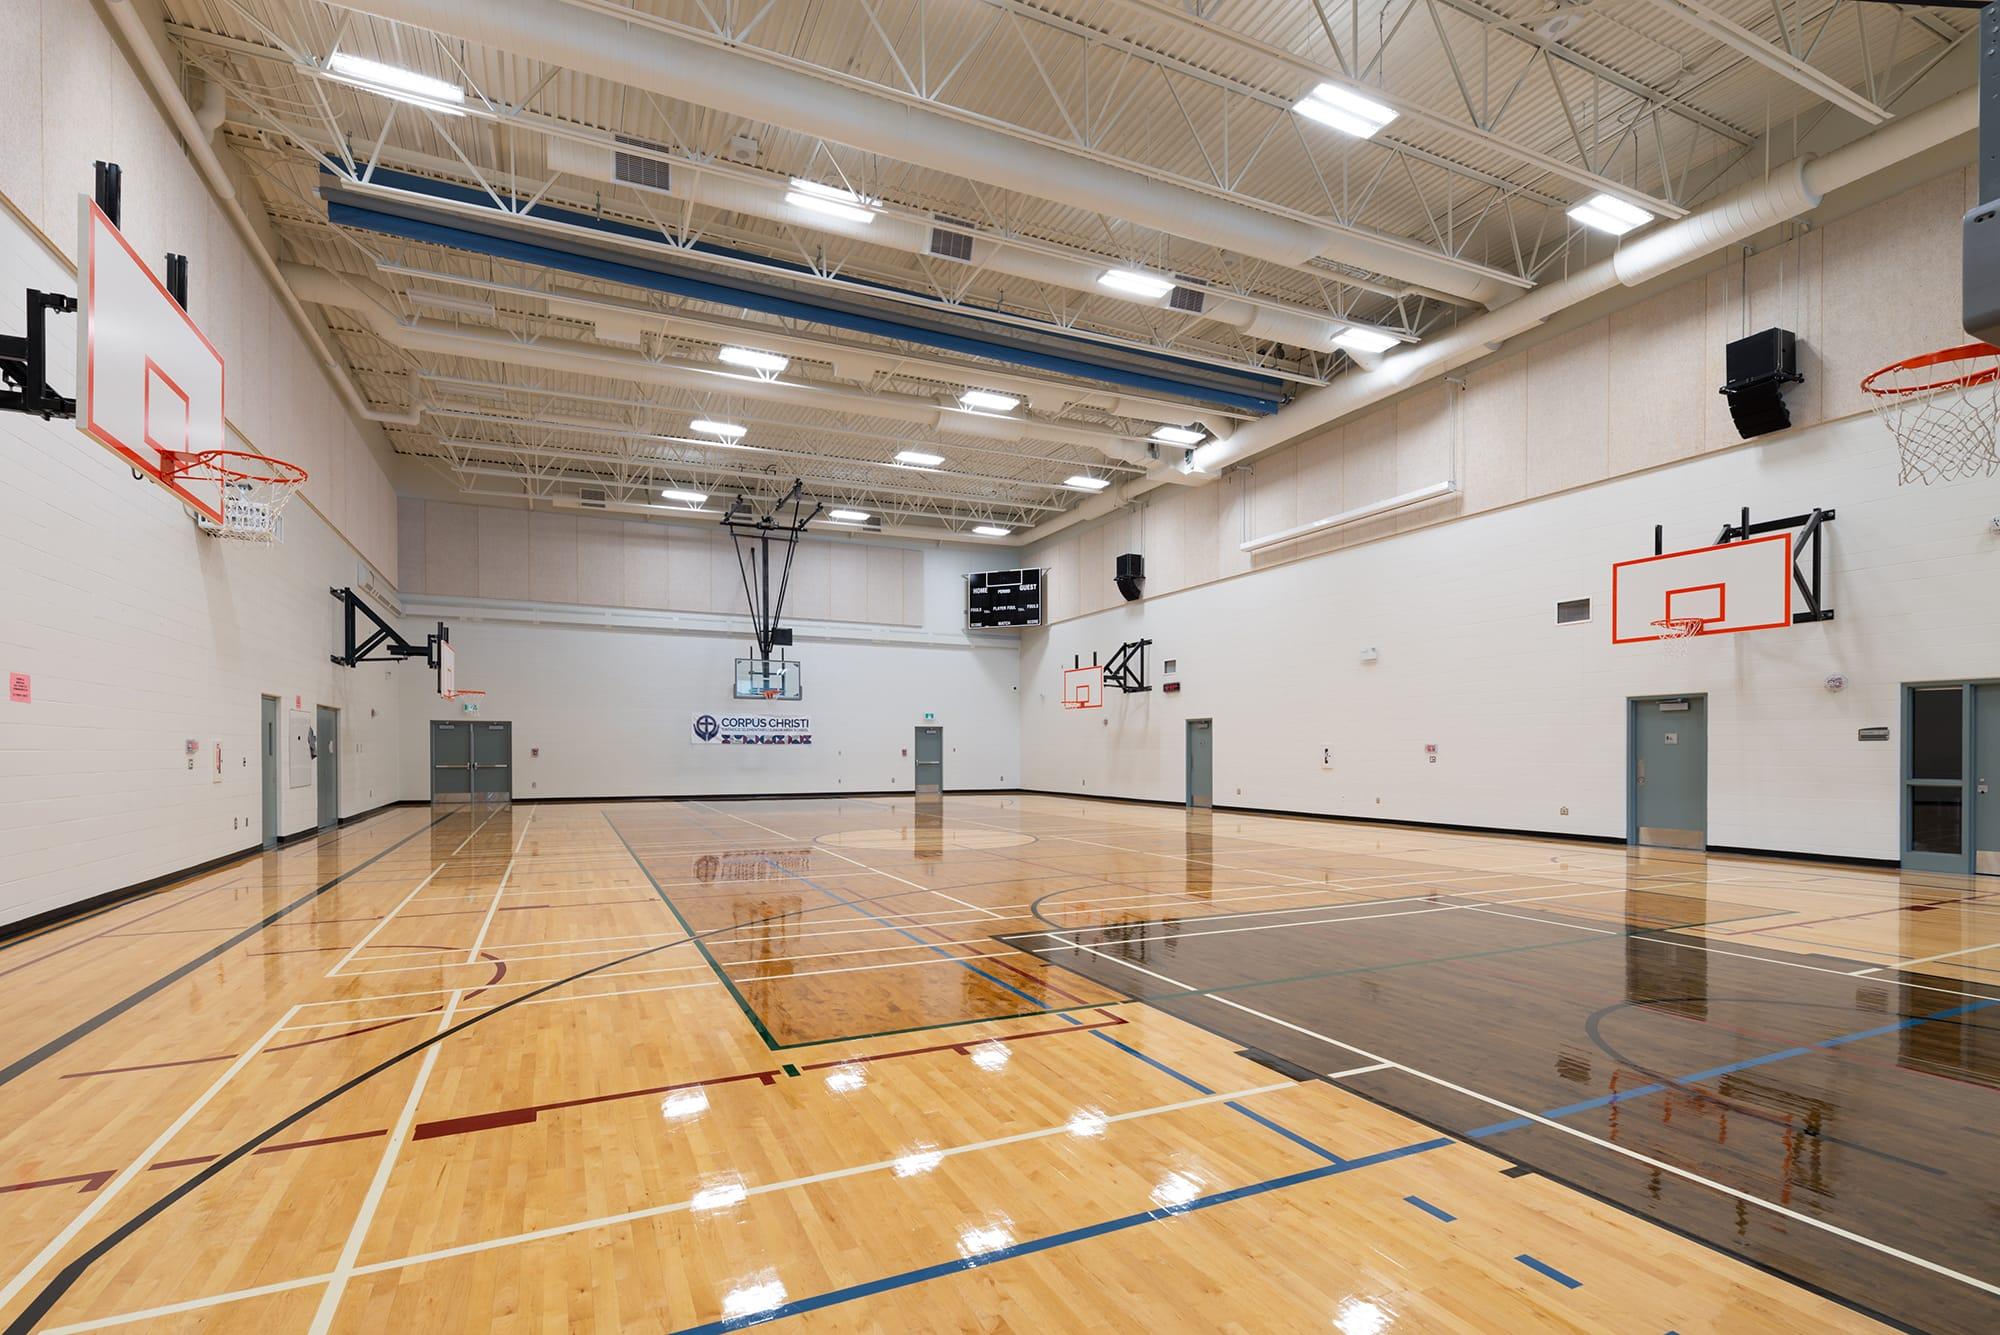 Corpus-Christi-Catholic-School interior gymnasium